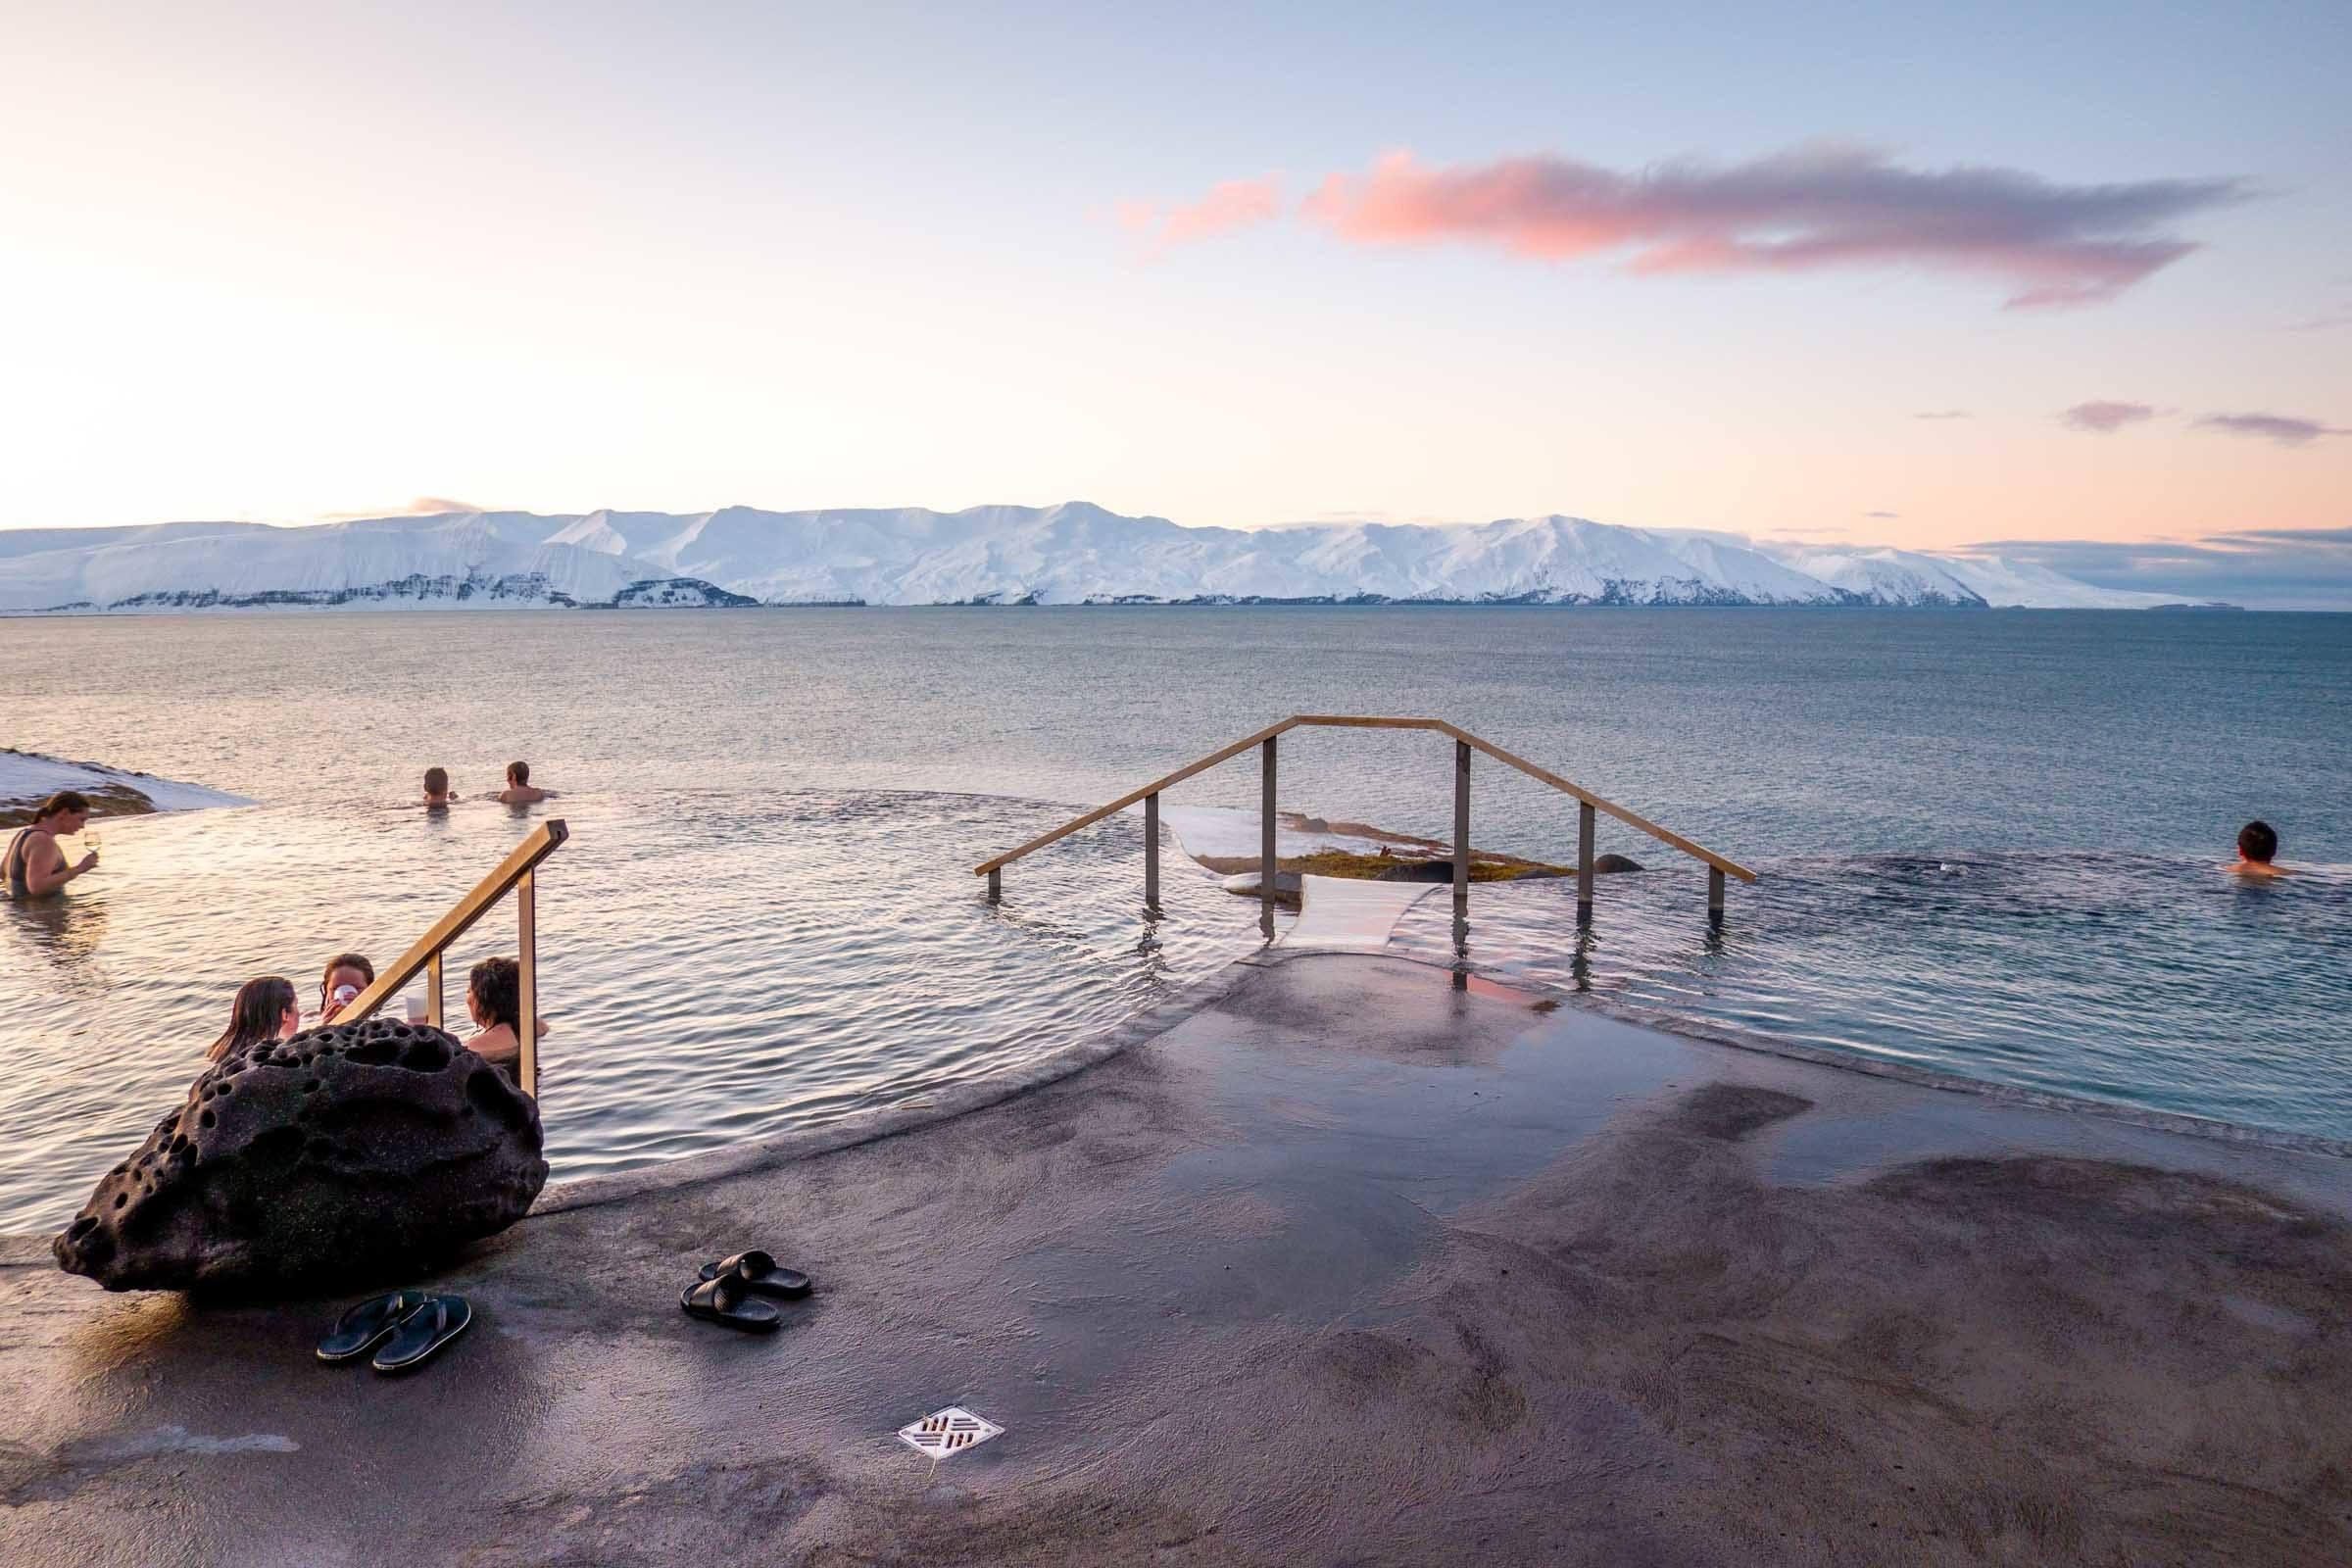 Bathers in the infinity pool at the Geosea Geothermal Sea Baths in Husavik.